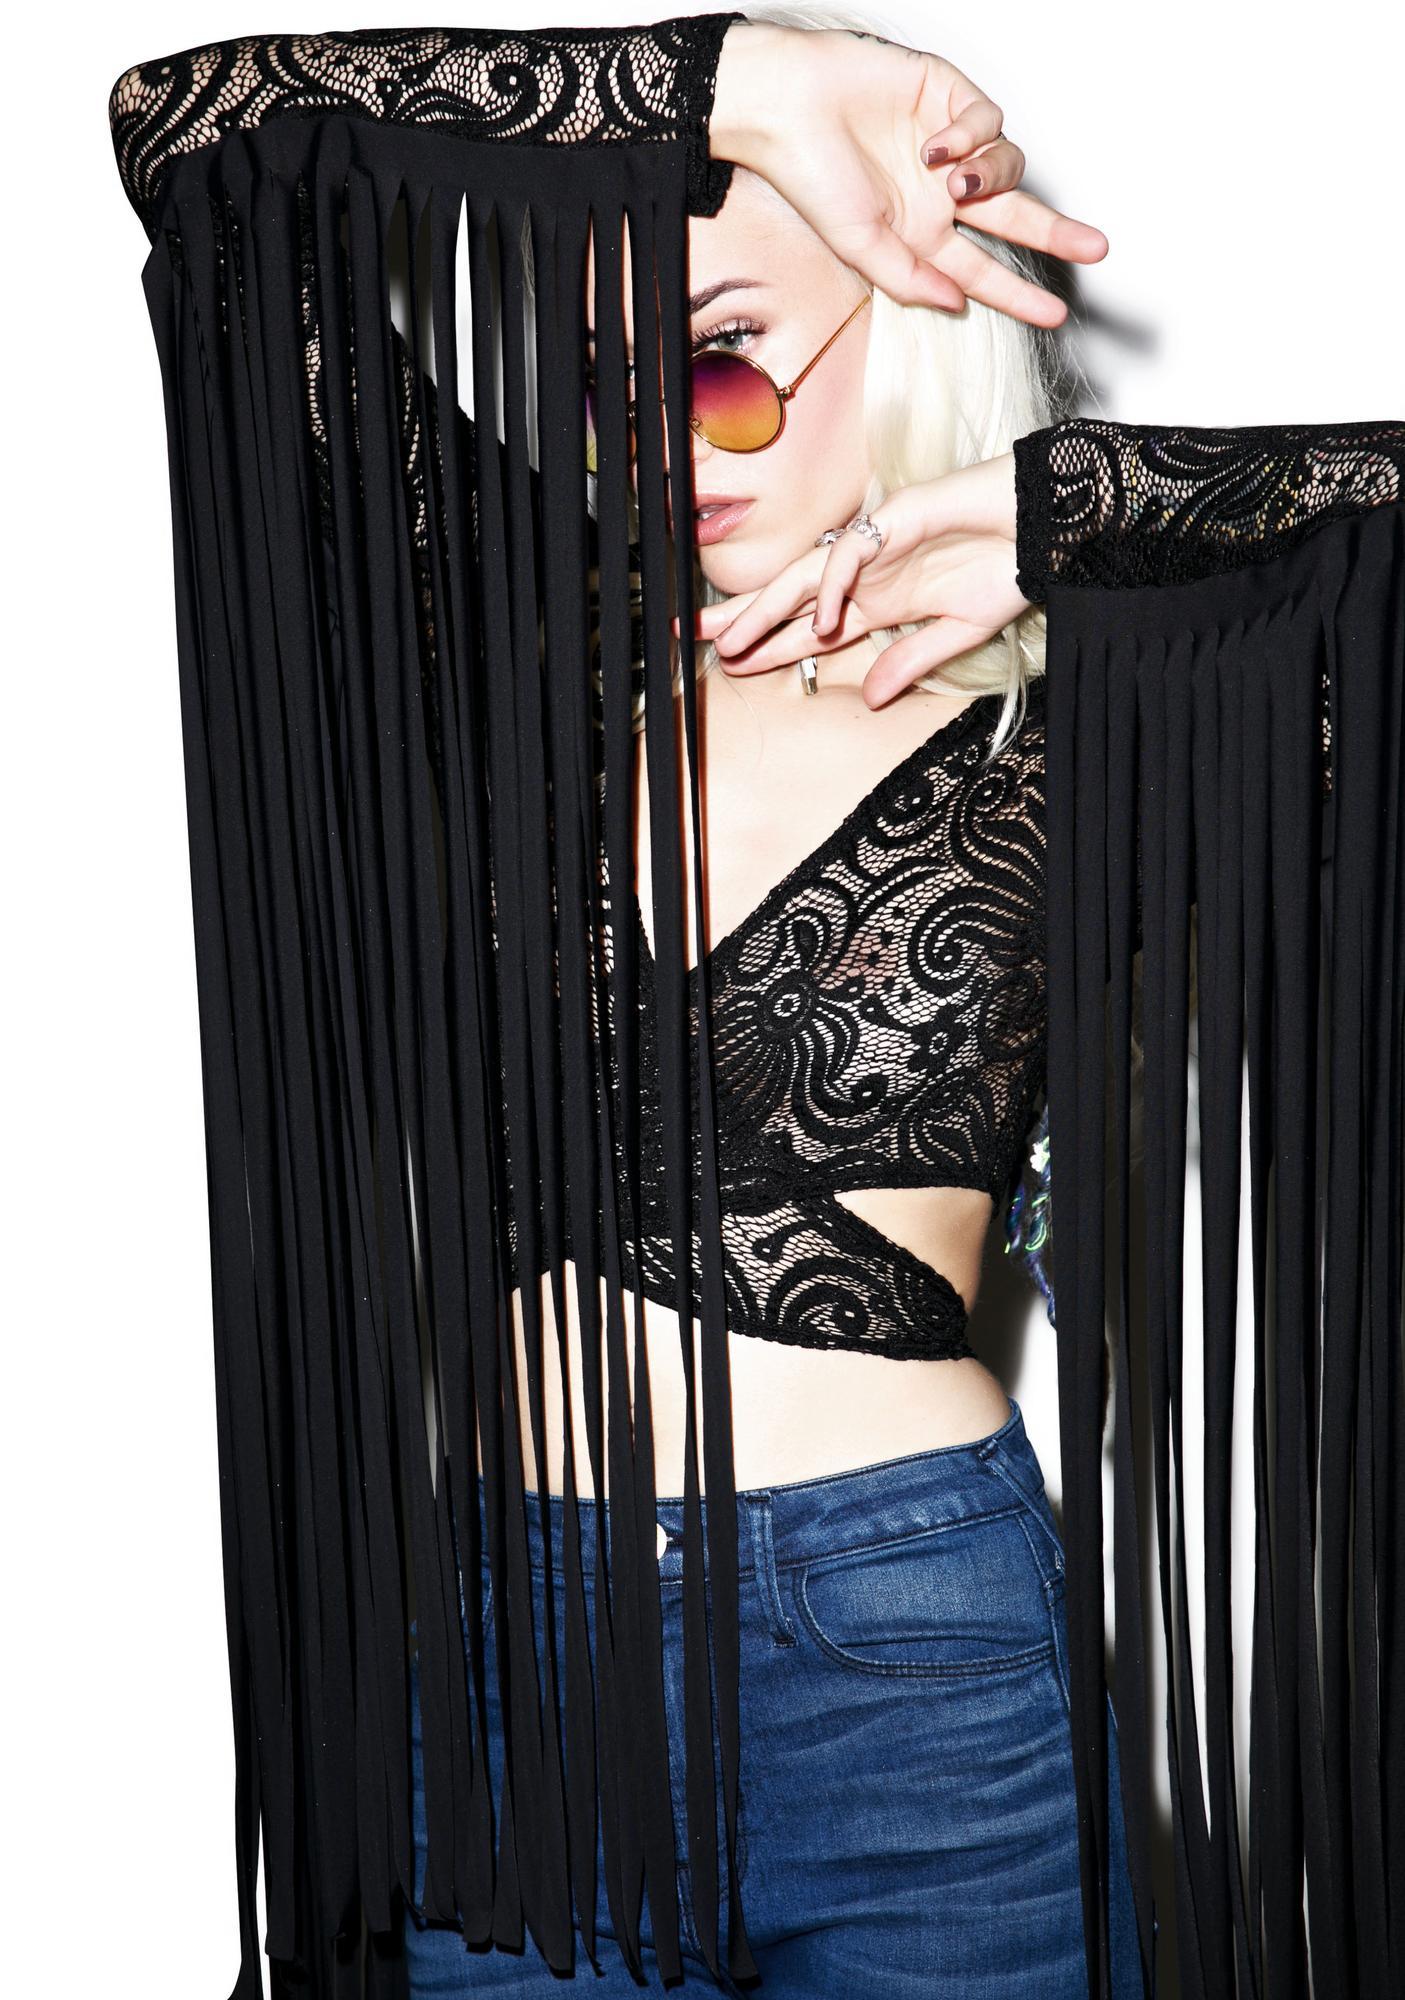 J Valentine Dark Widow Fringed Long Sleeve Top